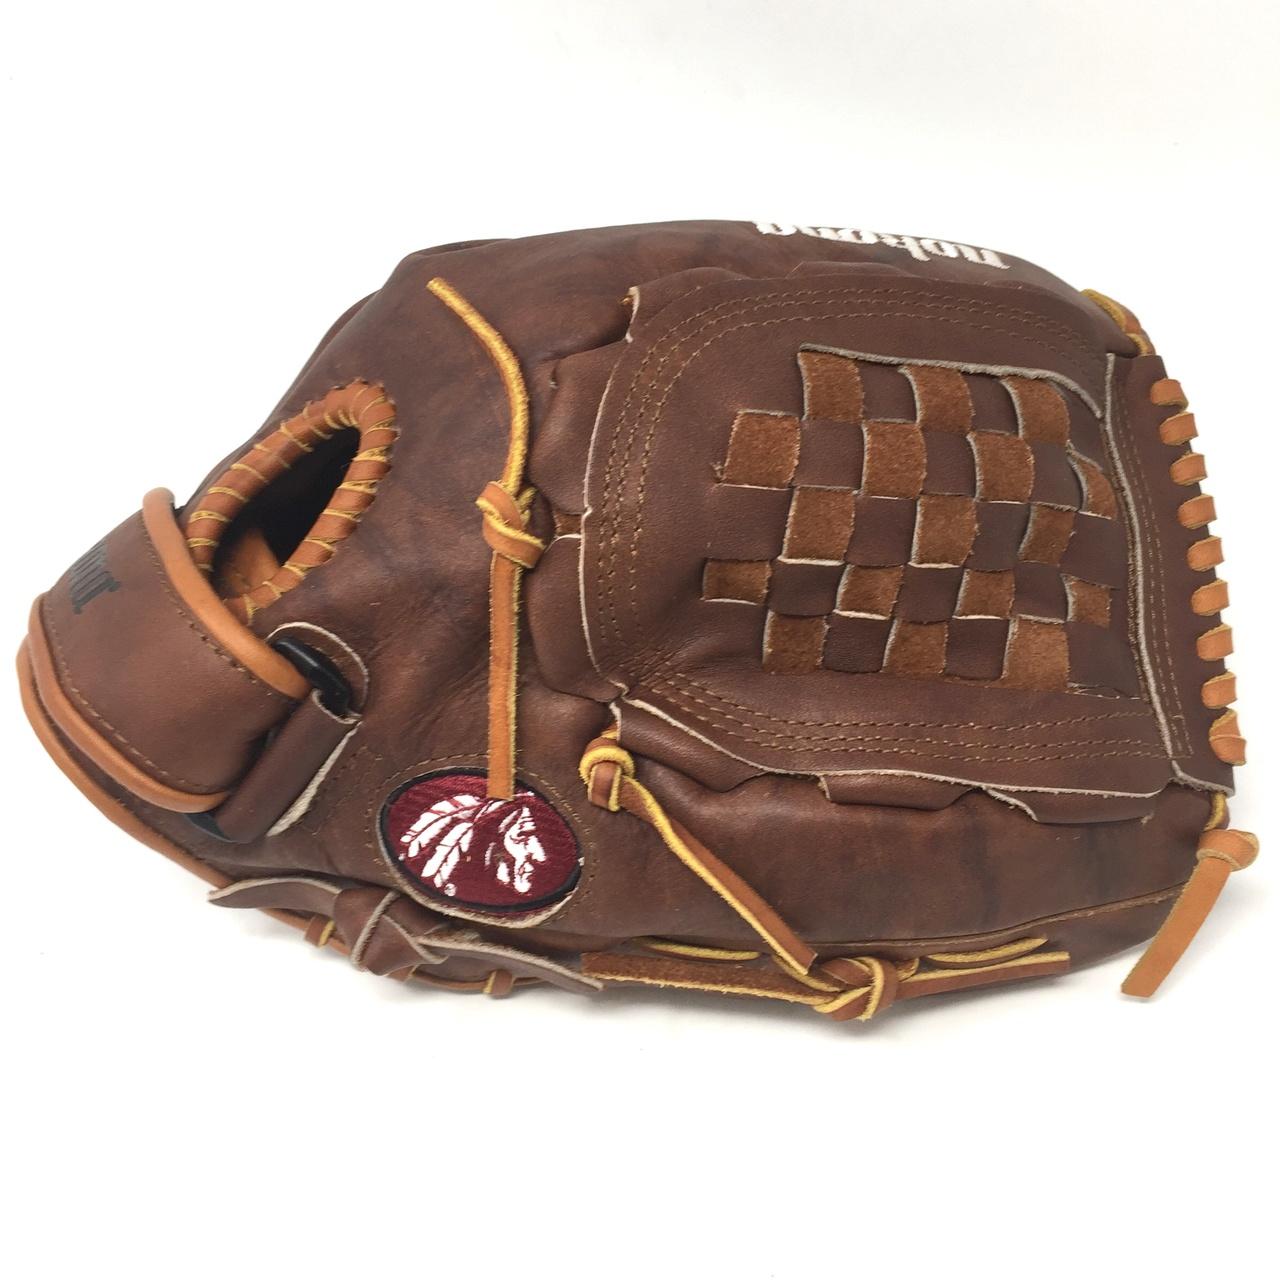 nokona-walnut-13-inch-softball-glove-w-v1300c-right-hand-throw W-V1300C-RightHandThrow  808808891789 Inspired by Nokonas history of hancrafting ball gloves in America for